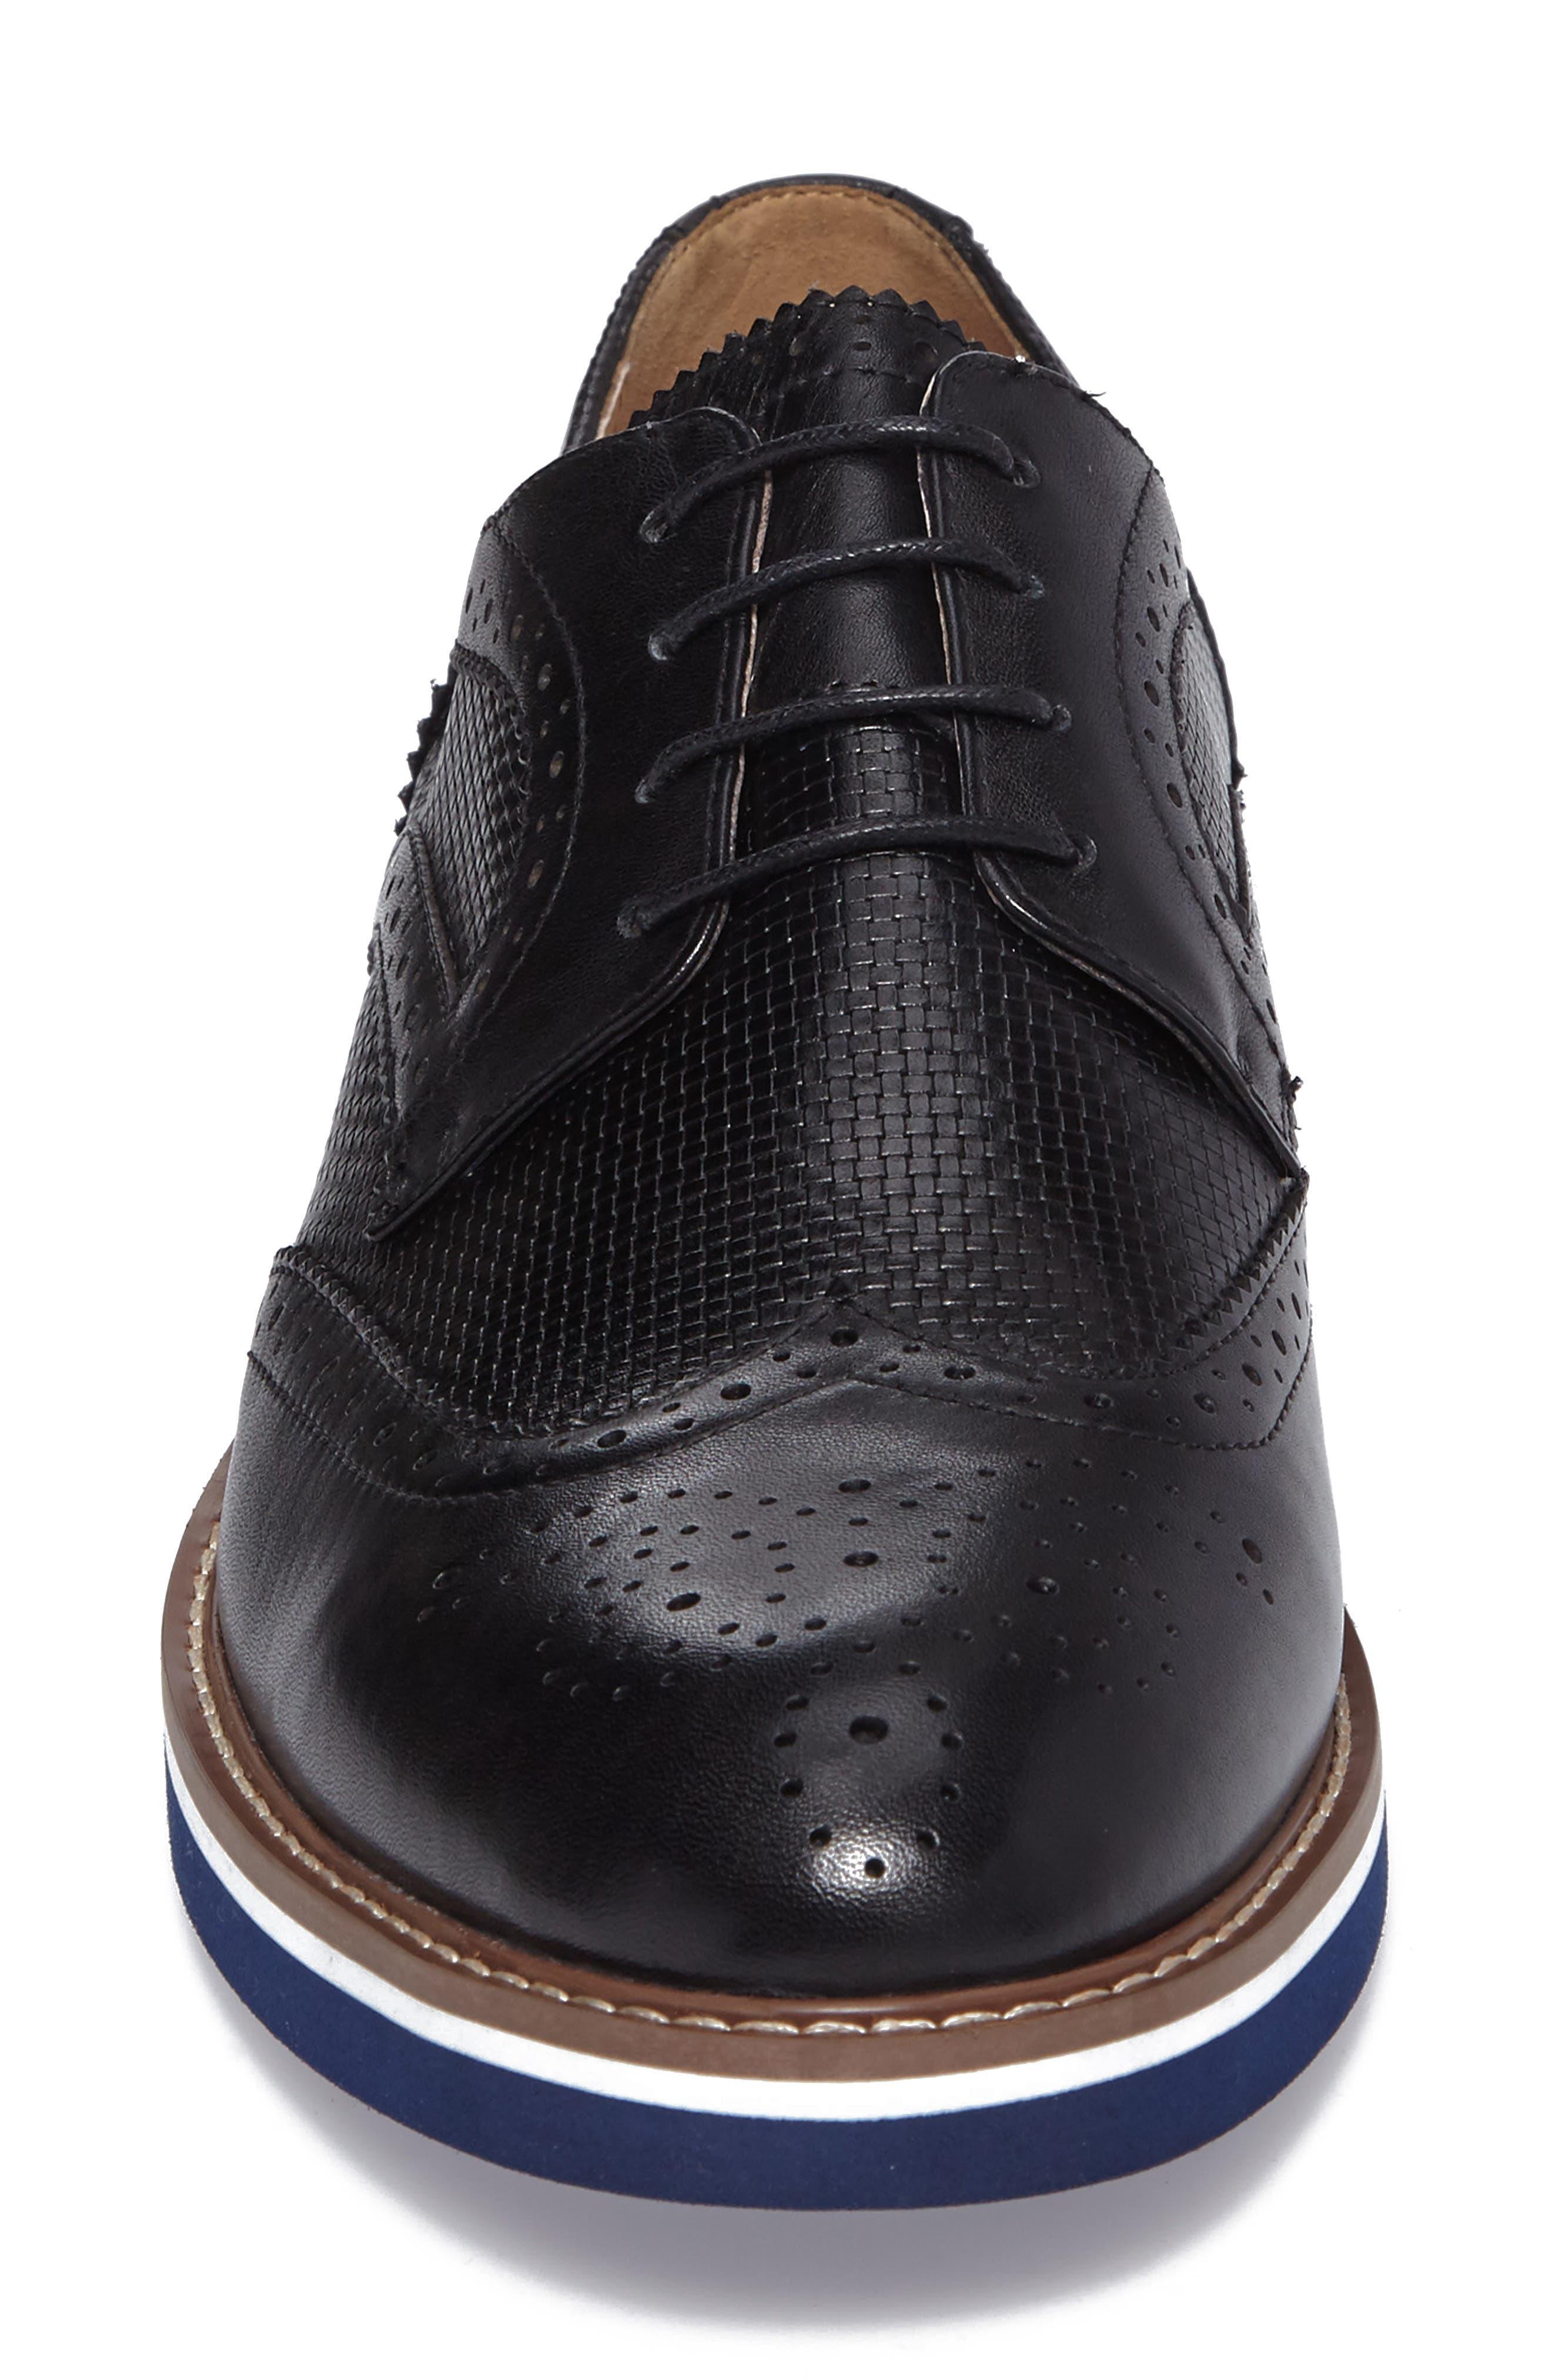 Northfields Spectator Shoe,                             Alternate thumbnail 4, color,                             001